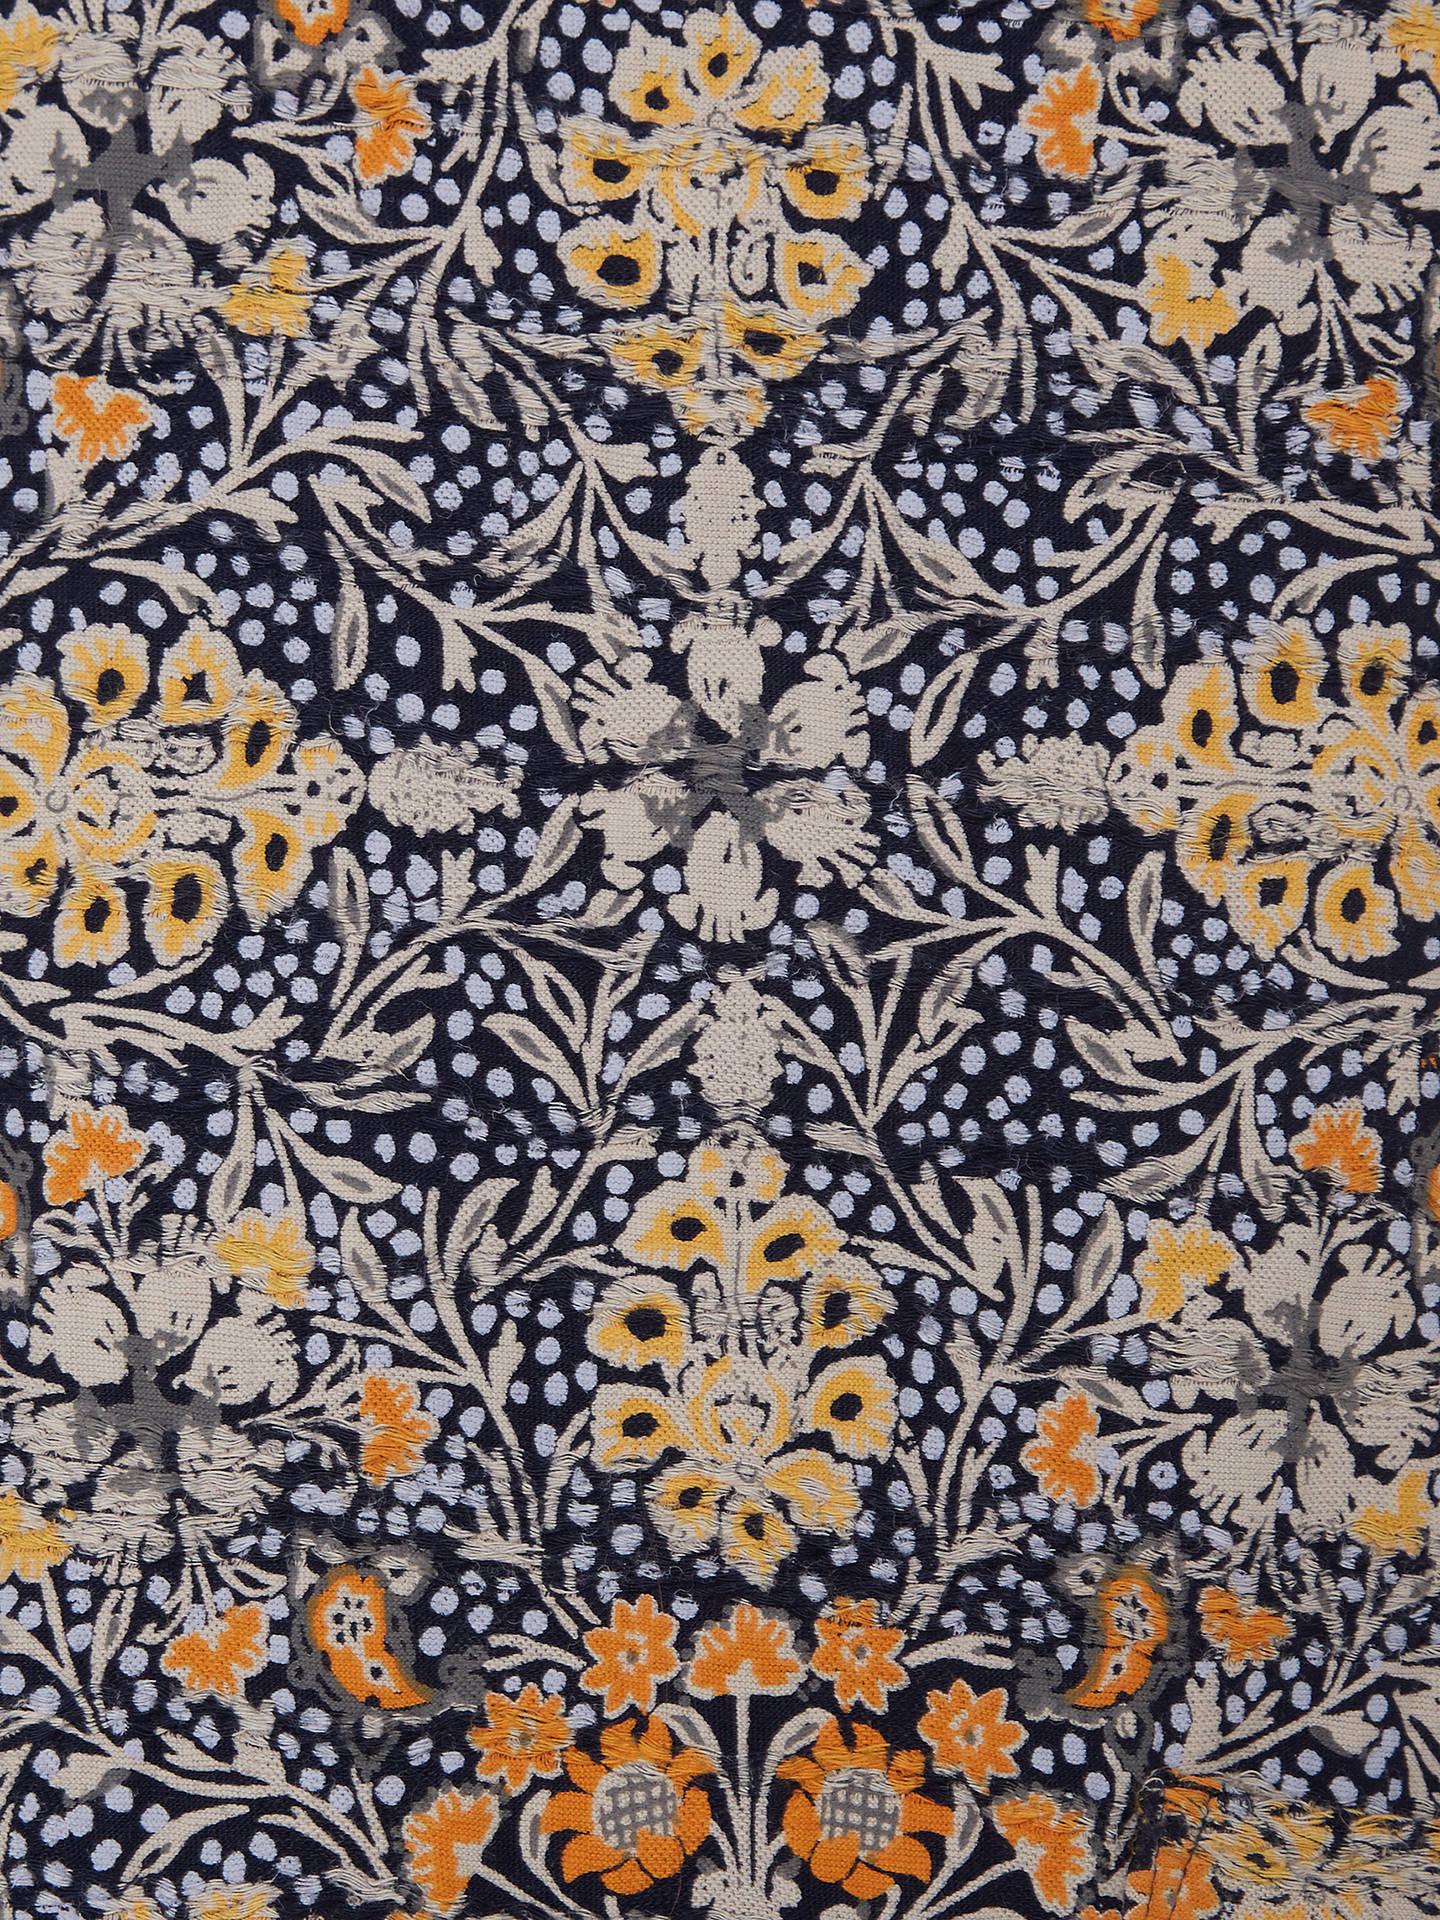 7eb3464f379 Buy White Stuff West Fourth Jersey Tunic Dress, Multi, 6 Online at  johnlewis.